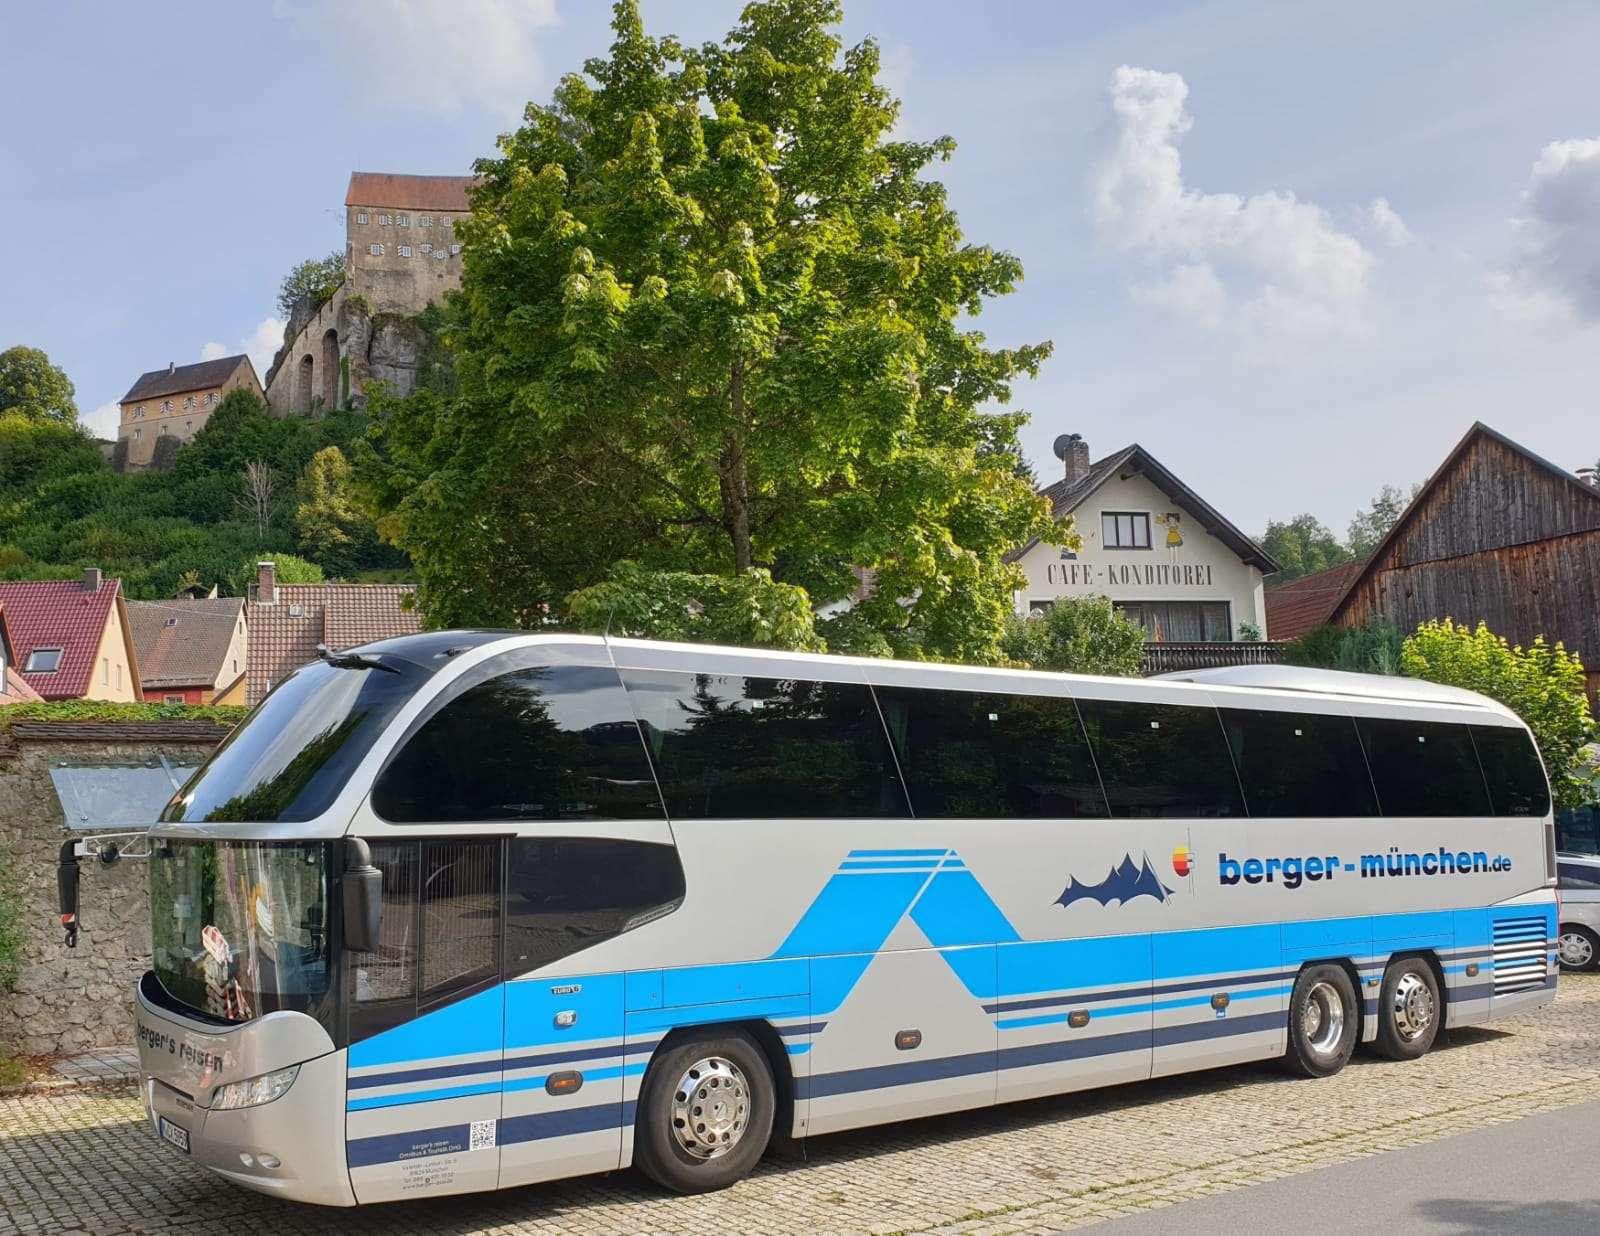 berger's reisen Omnibus & Touristik oHG